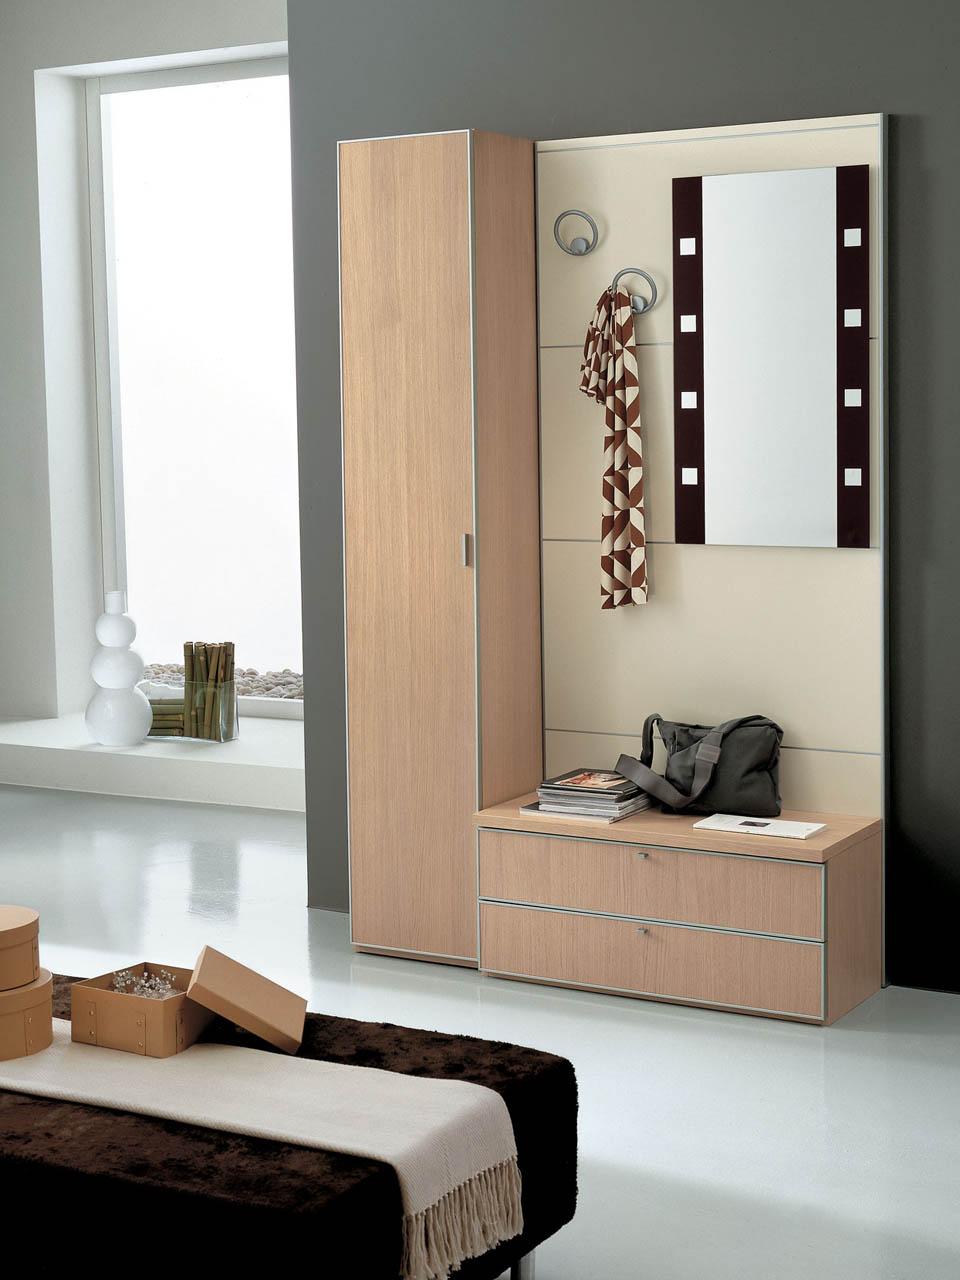 Ingresso dinamika 355 tutto mobili arredamento camere - Mobili ingresso roma ...